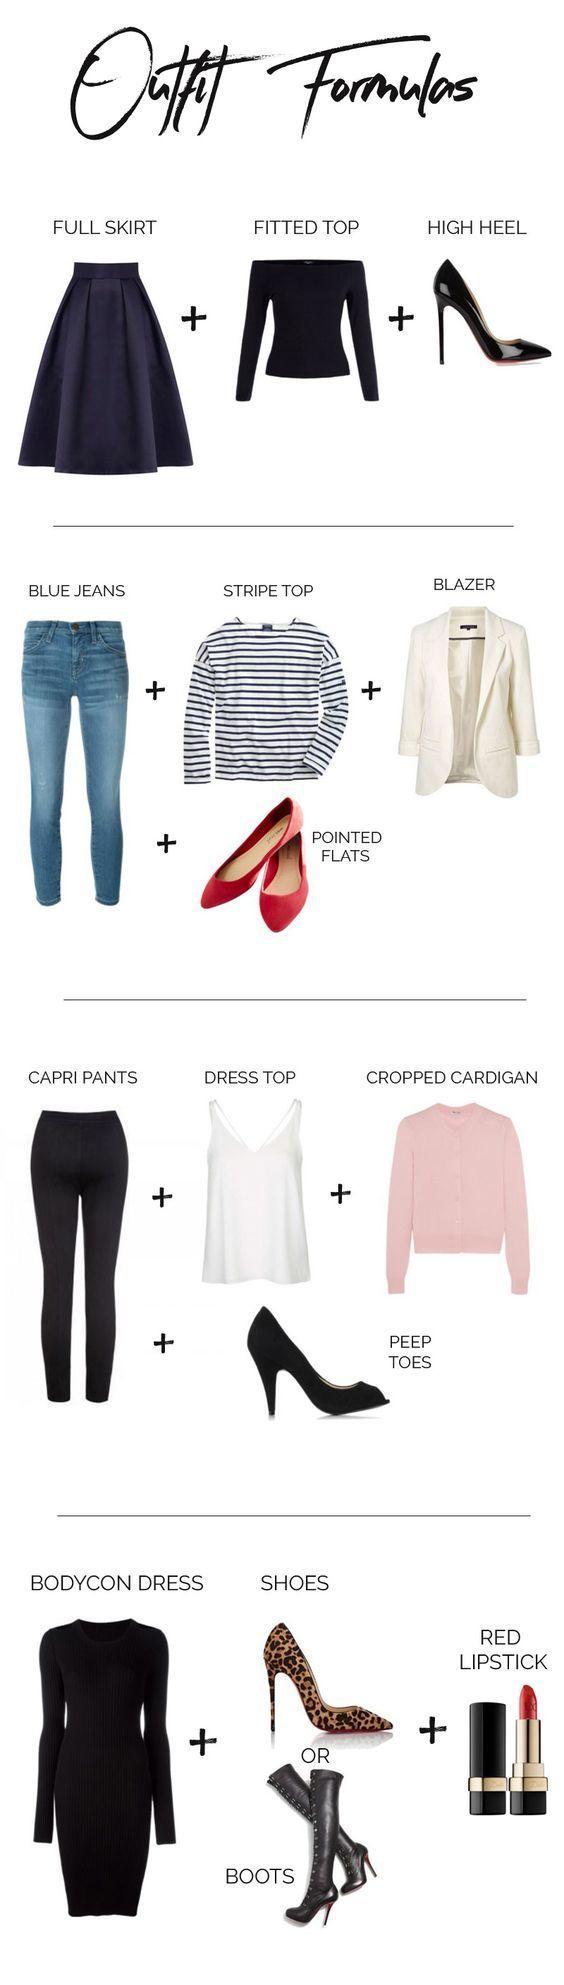 4 Outfit Formulas That Never Fail